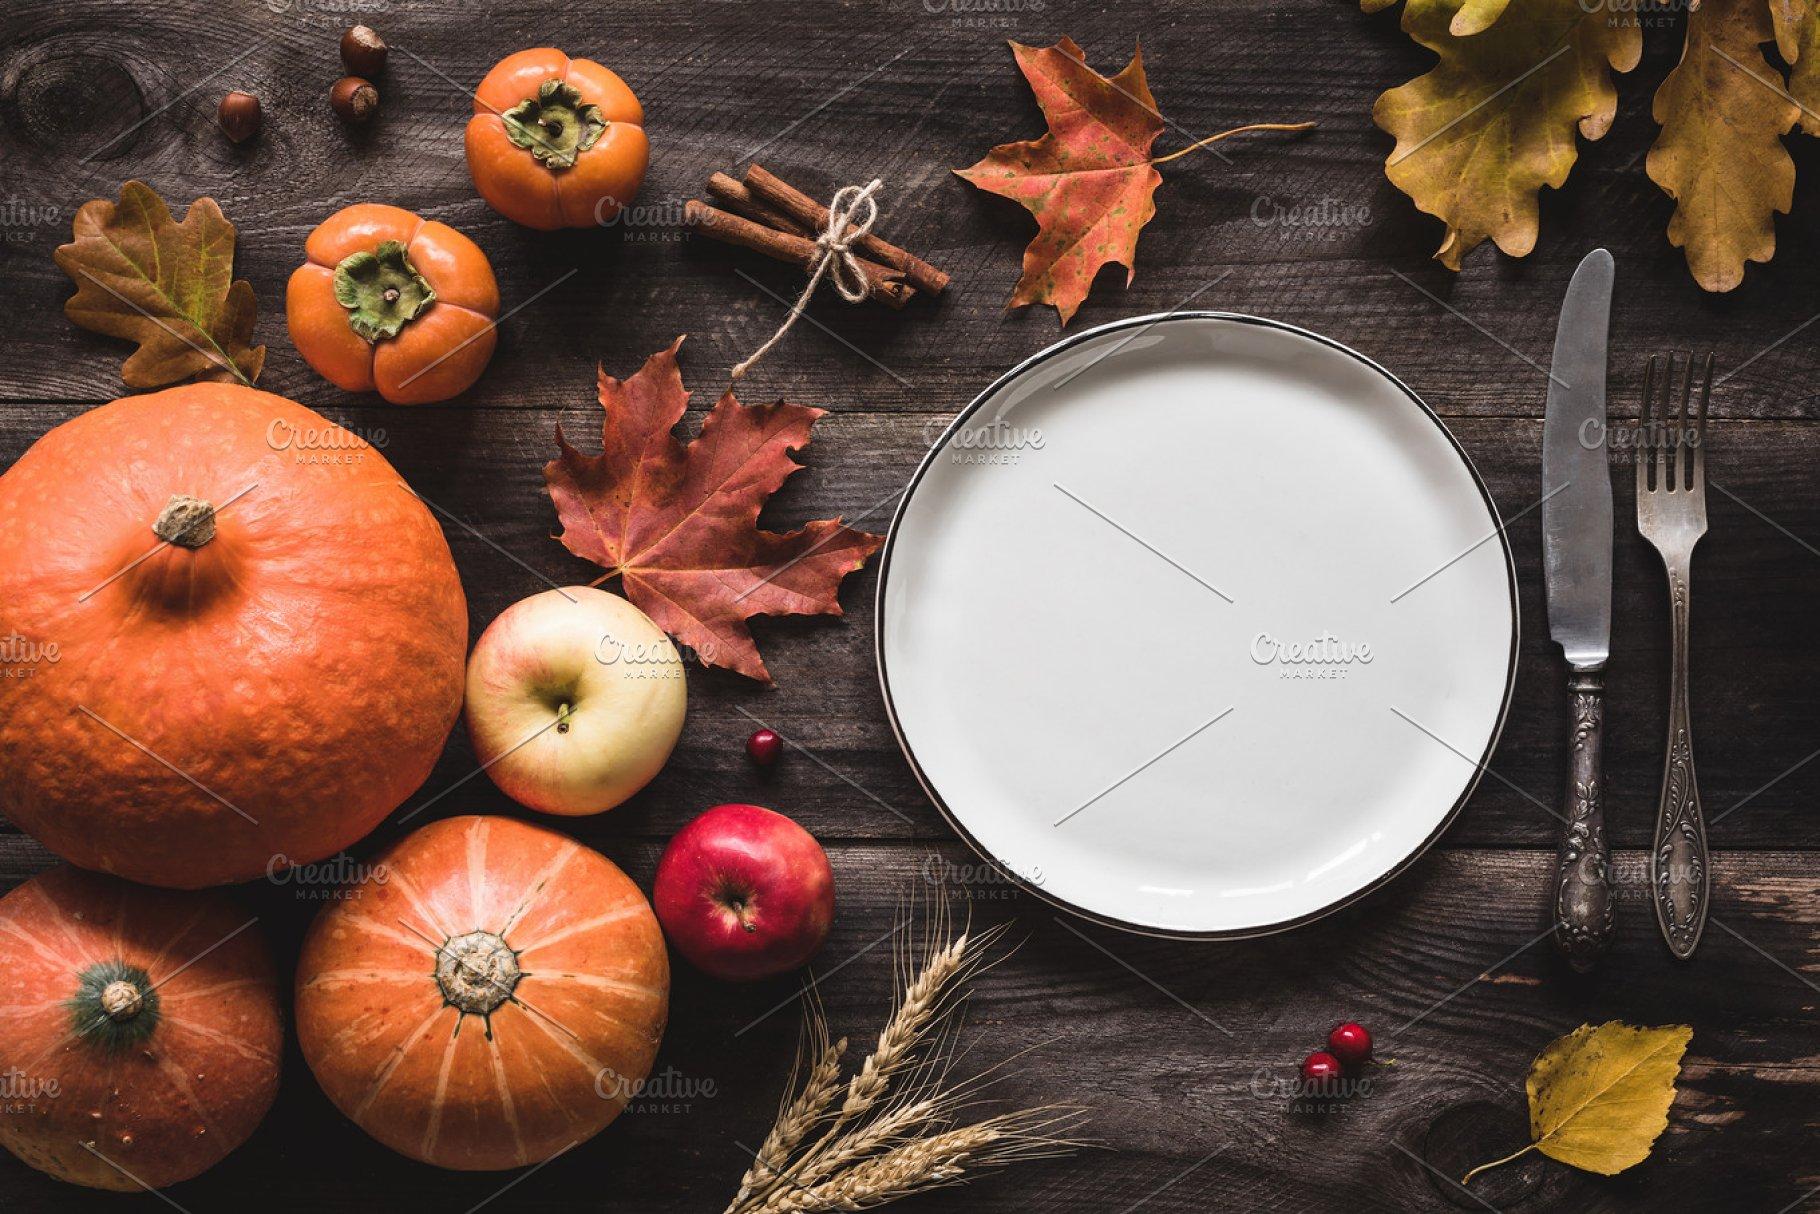 Halloween Dinner Table Setting.Autumnal Table Setting For Thanksgiving Dinner Or Halloween